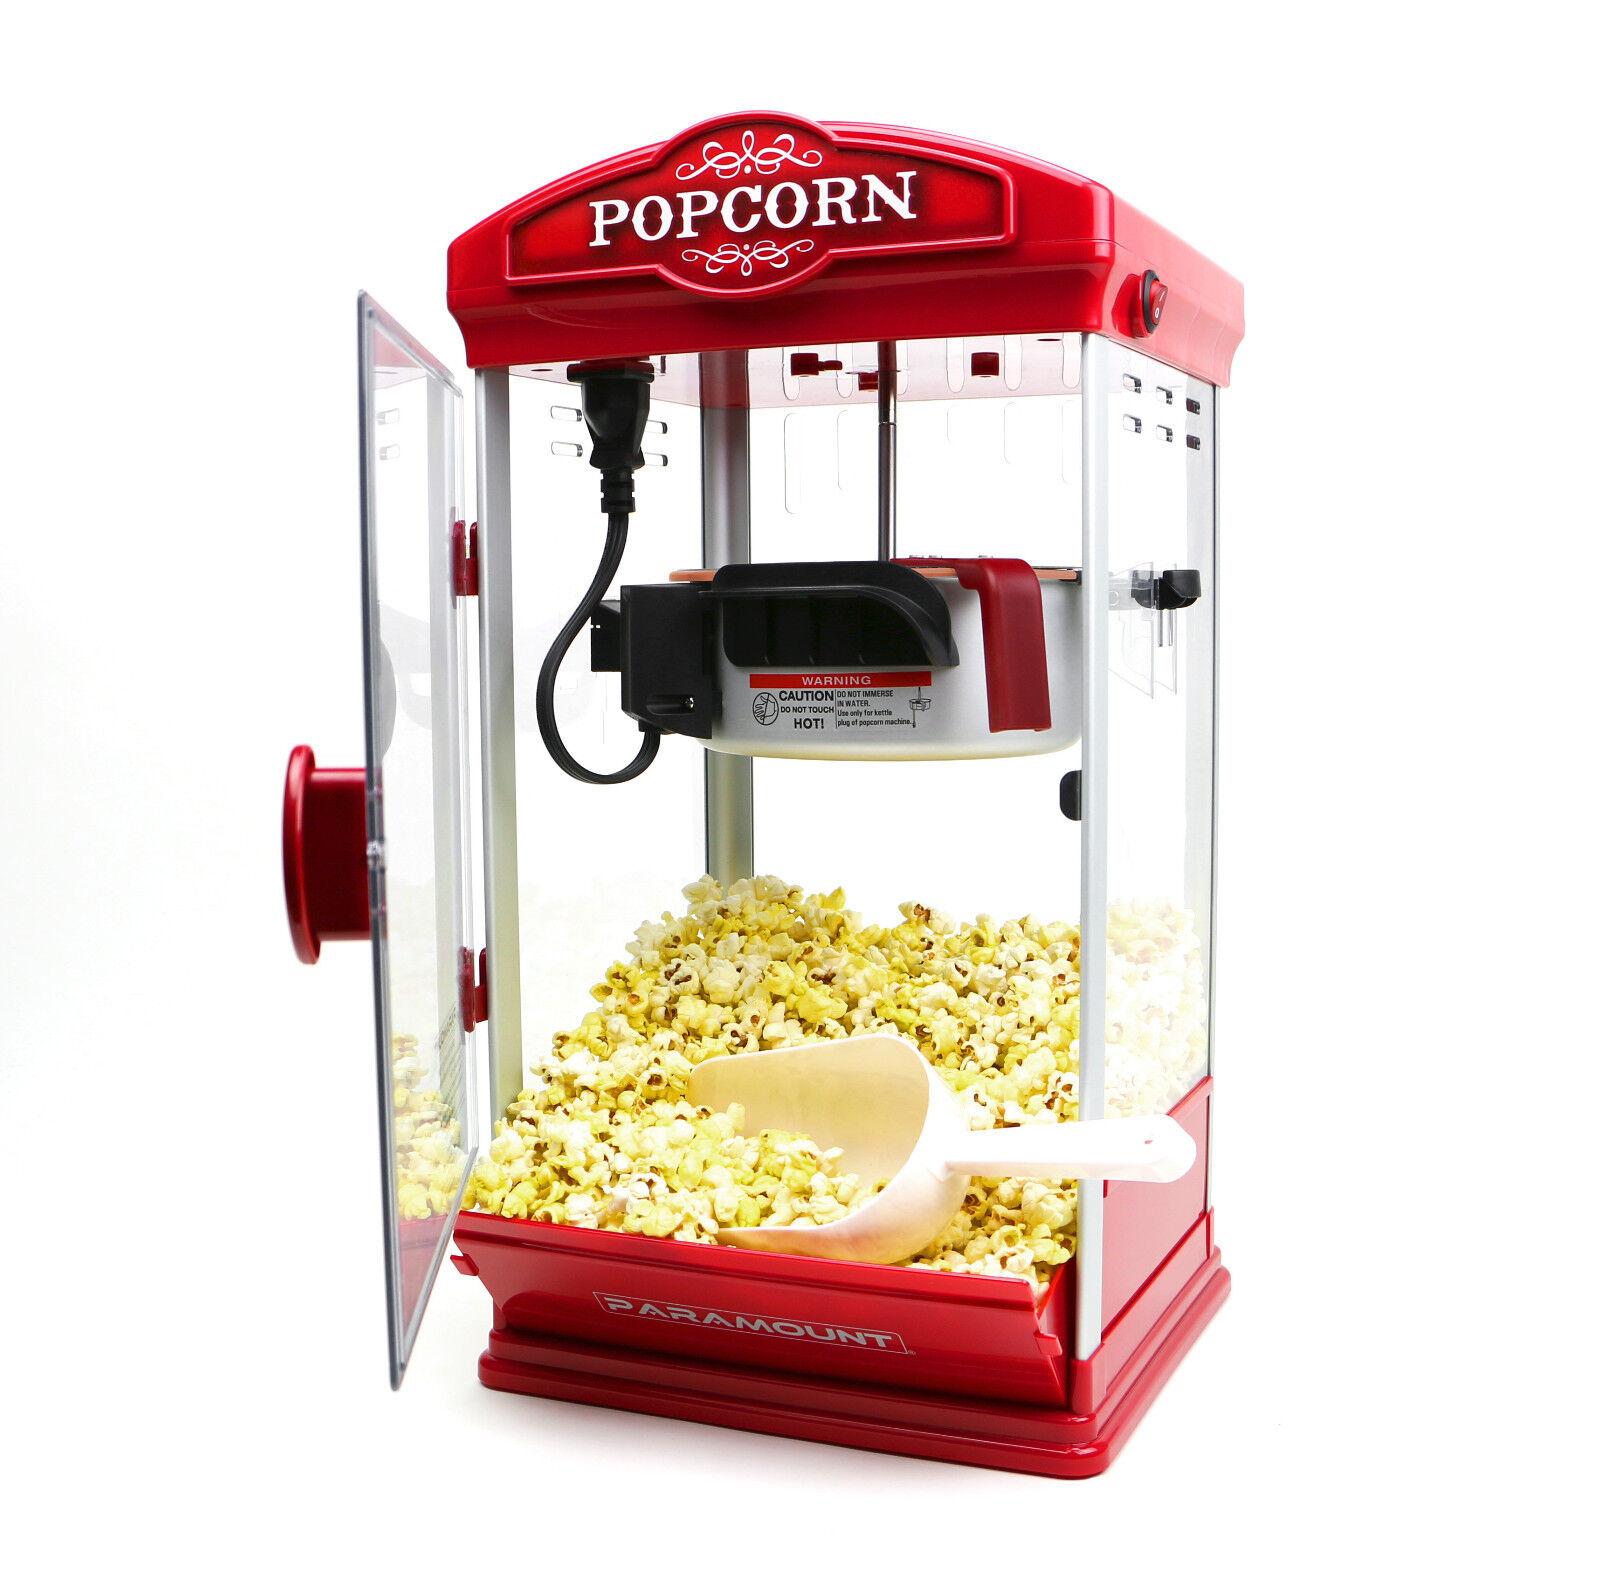 8oz red popcorn maker machine by new